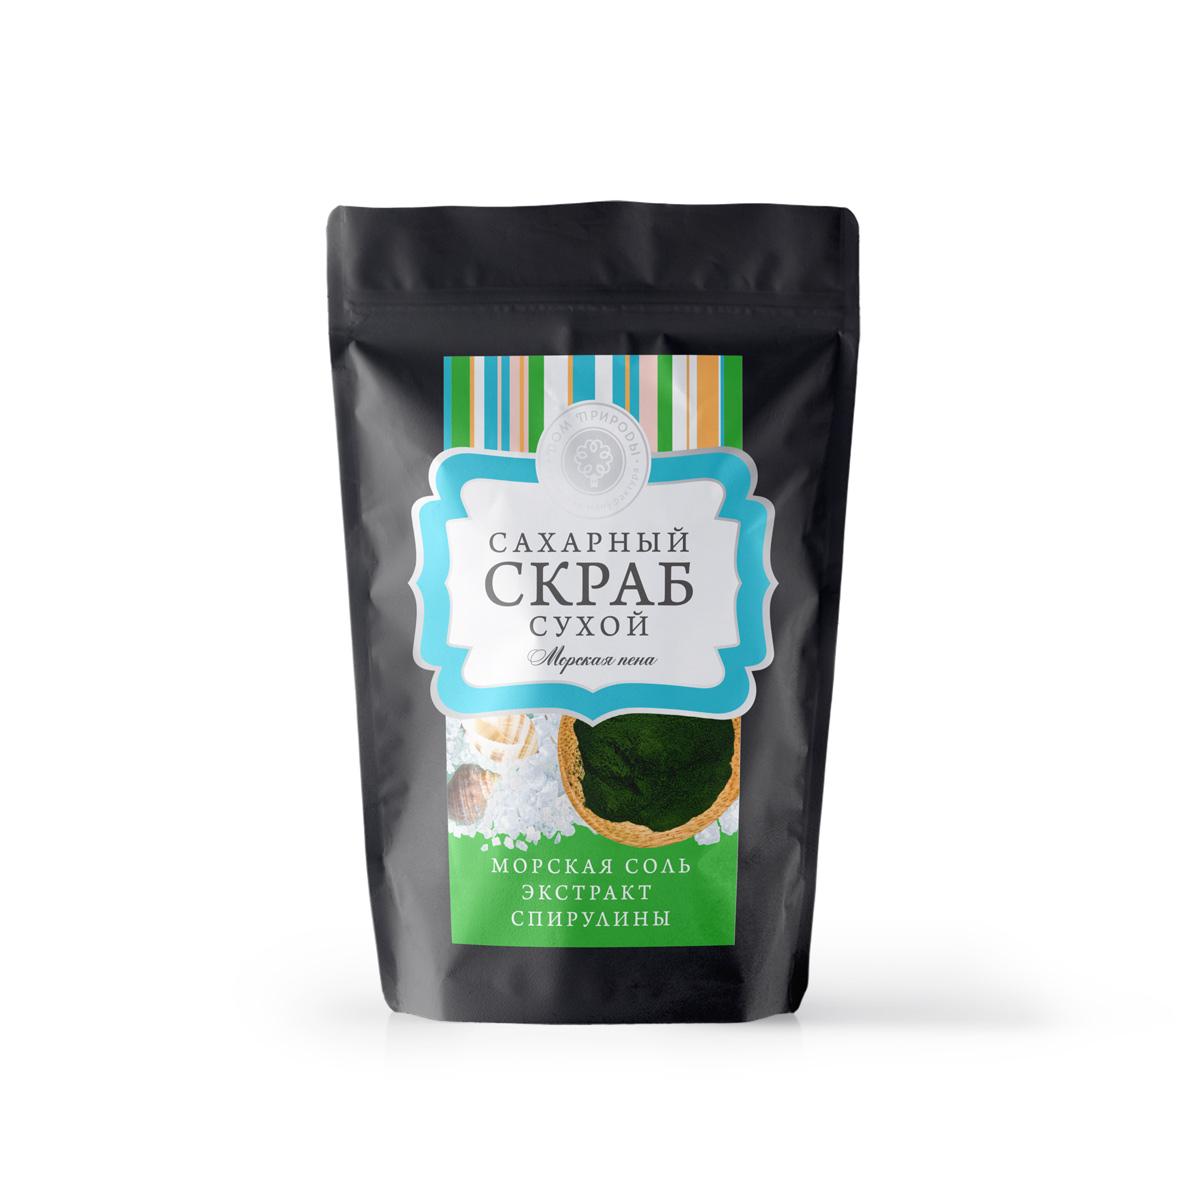 "Сухой сахарный скраб для тела ""Морская пена"" 250 гр."